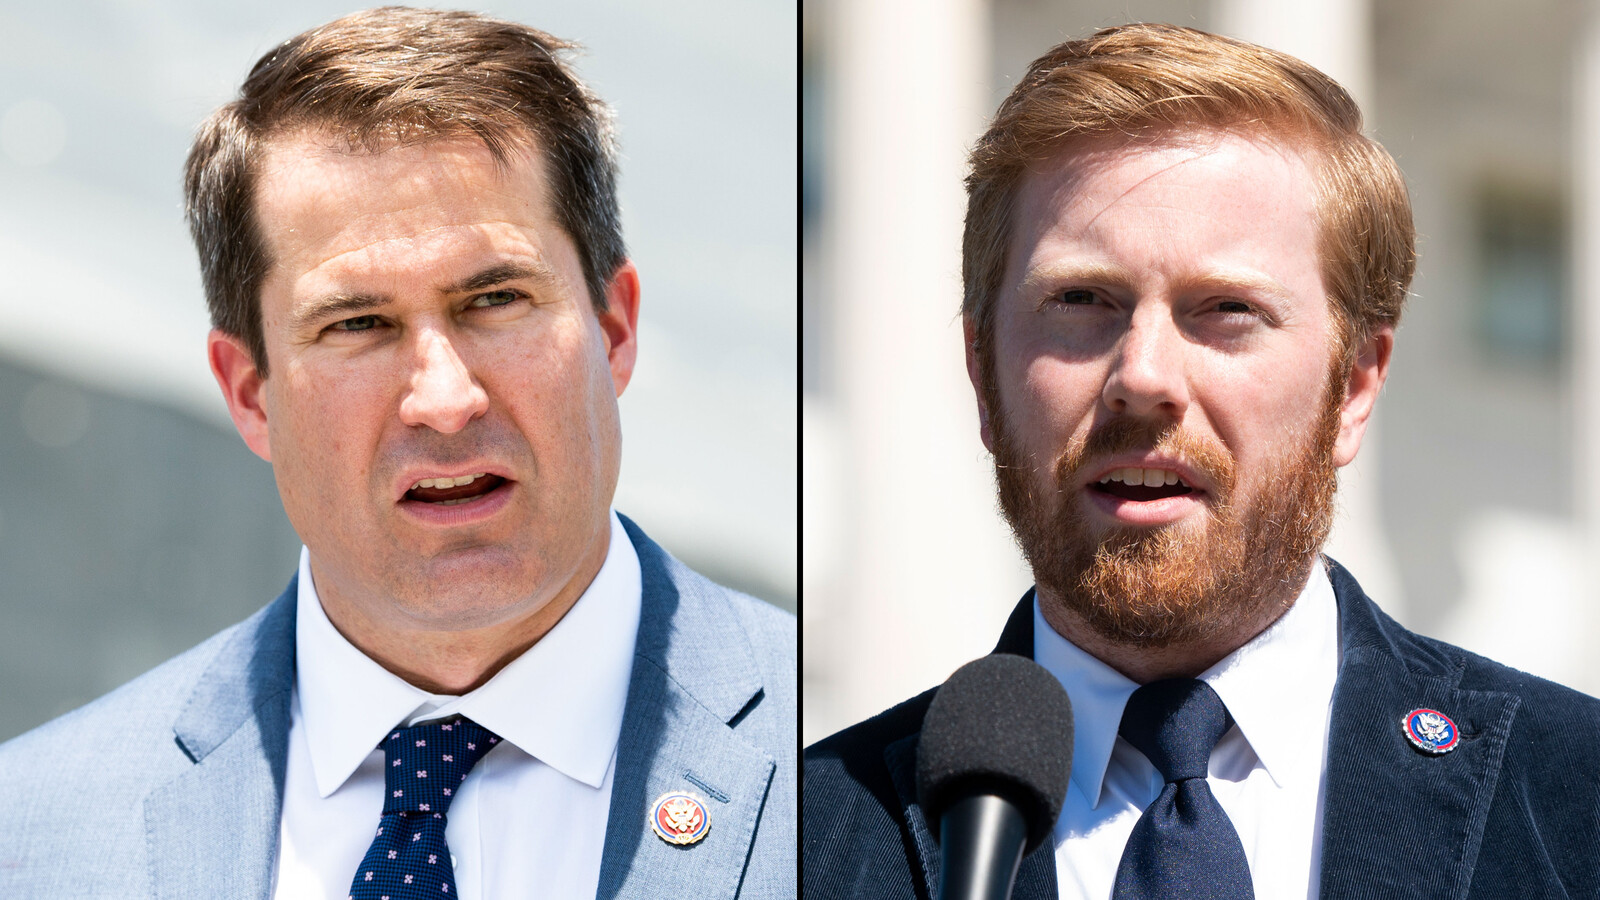 Two congressmen traveled to Afghanistan amid frantic evacuation efforts